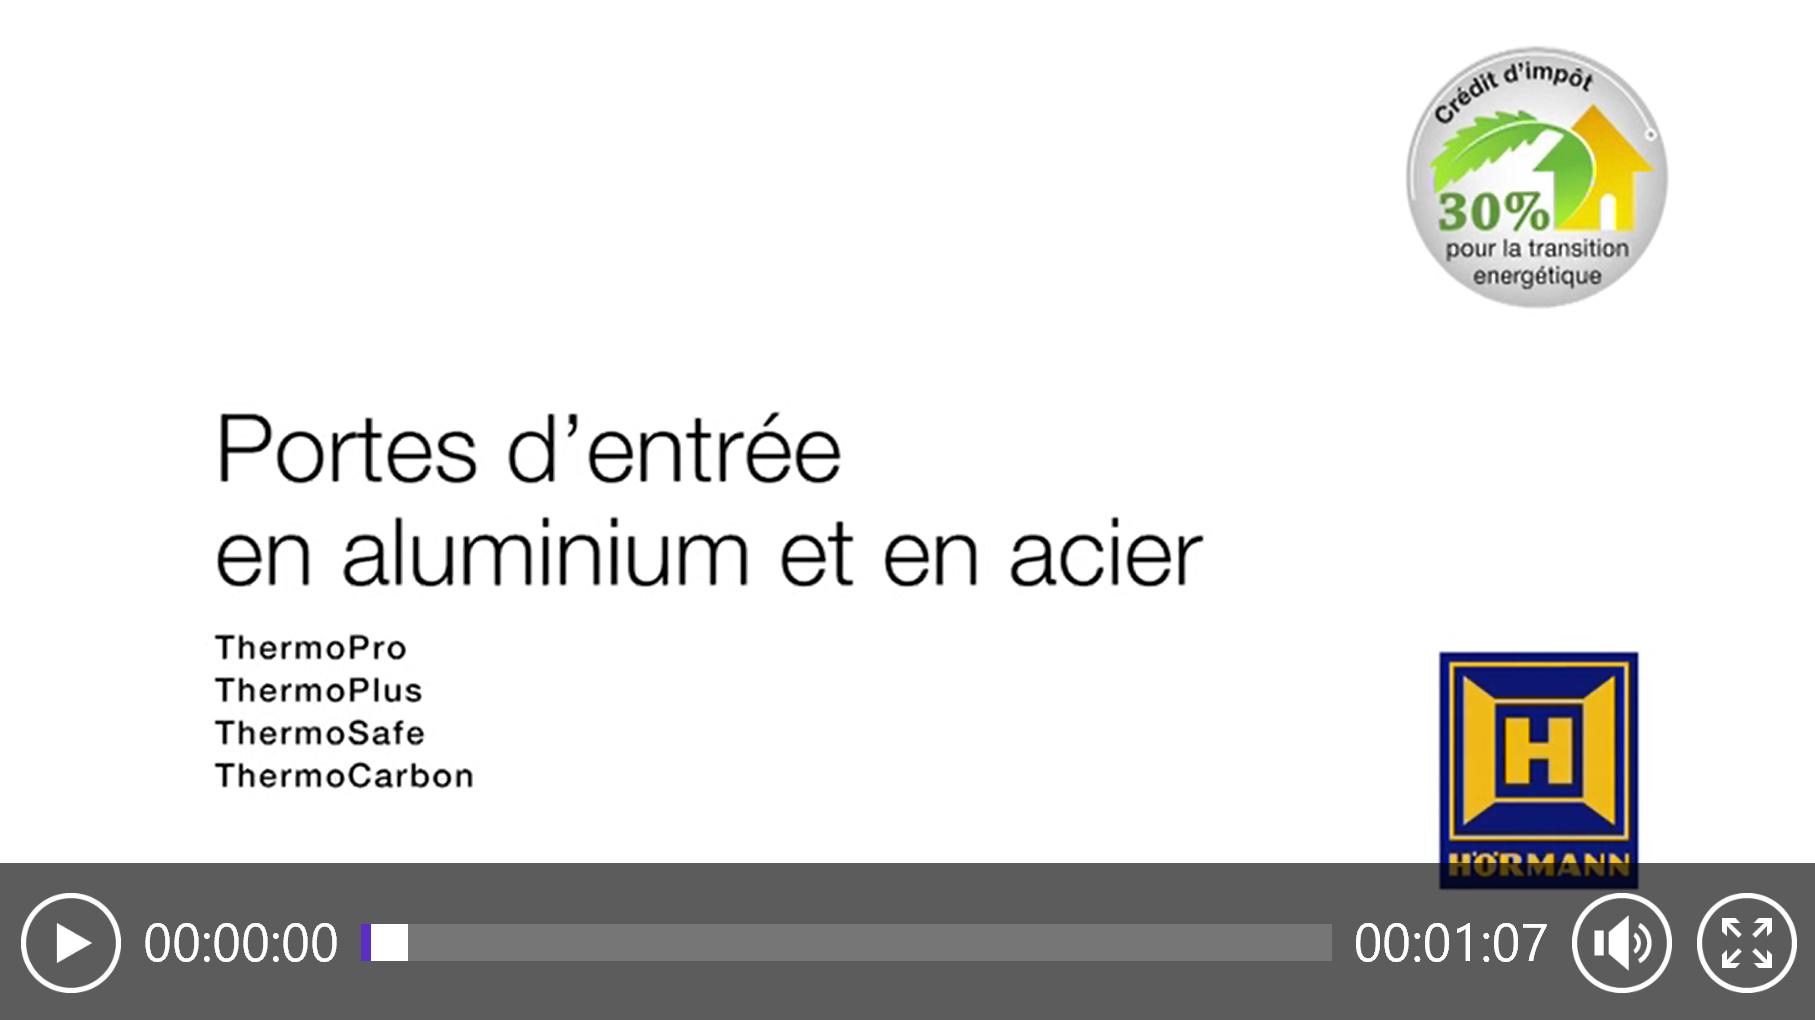 Portes d'entrée en aluminium et en acier